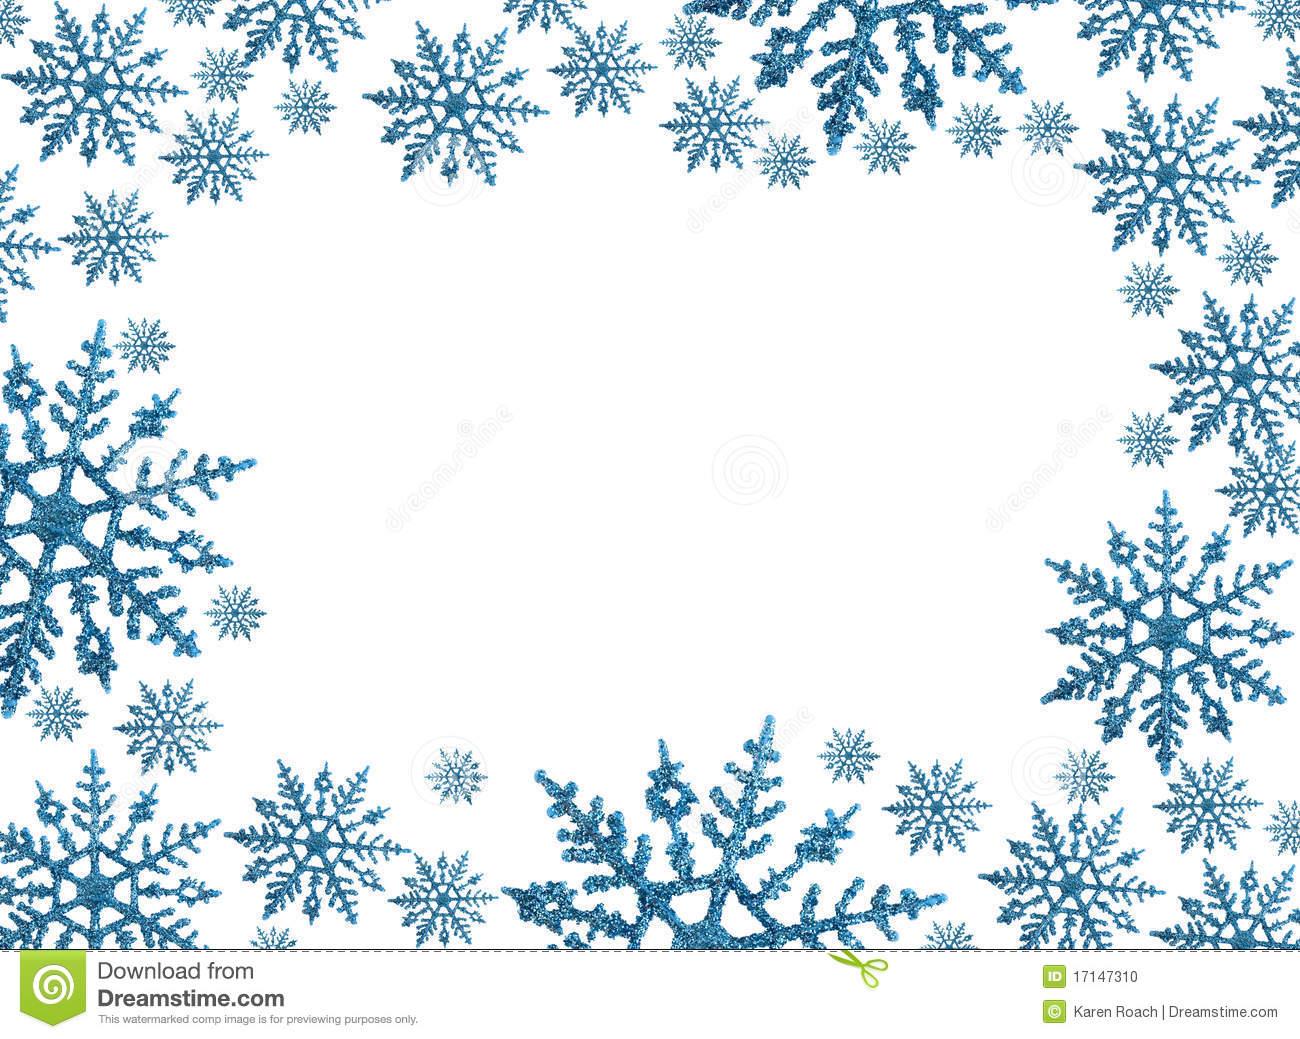 Snowflake Frame Clipart-Snowflake Frame Clipart-8